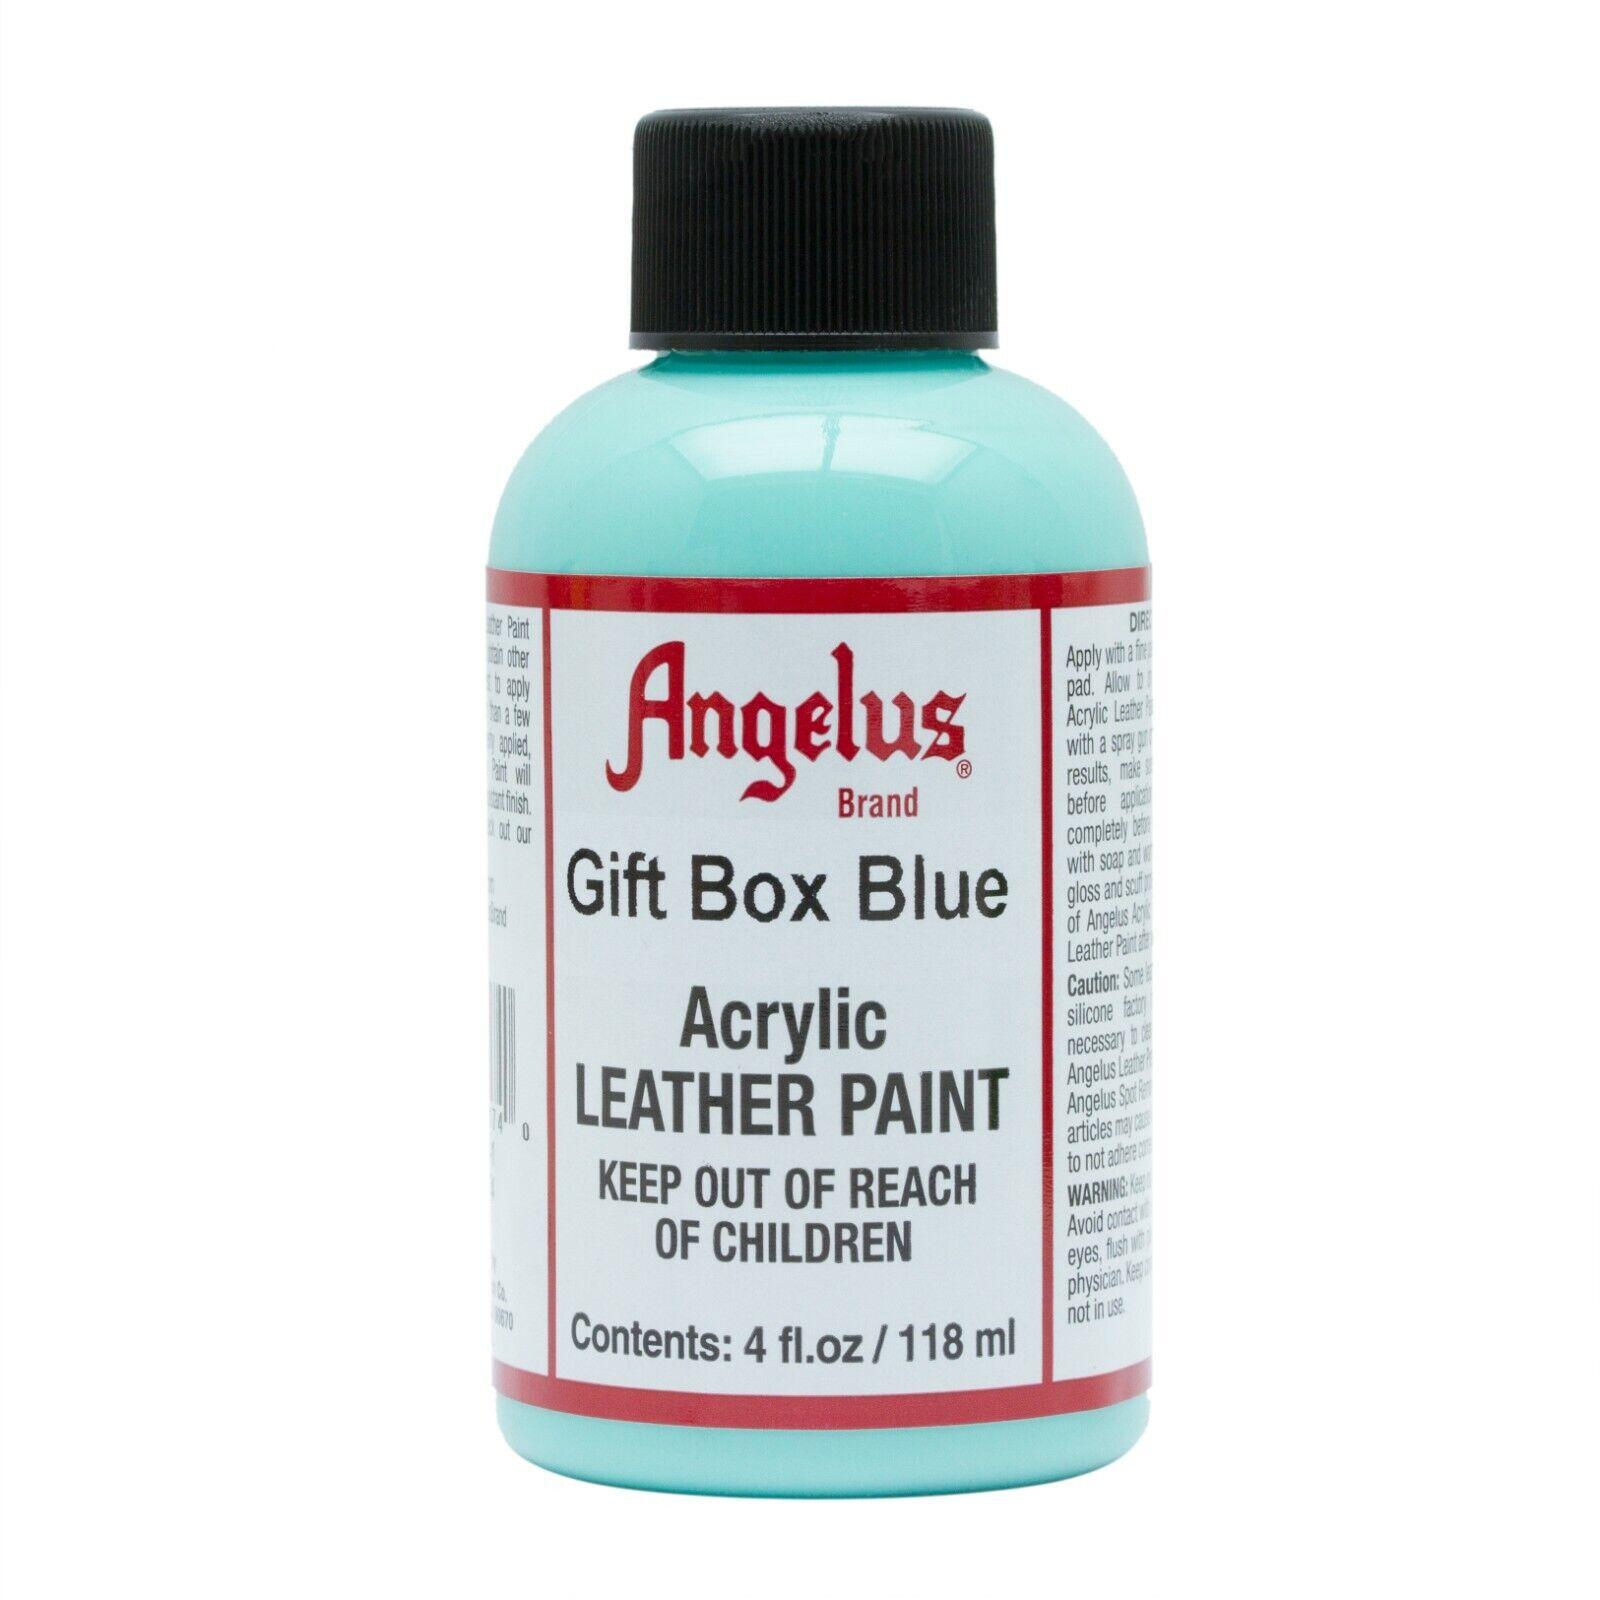 Angelus Acrylic Leather Paint Gift Box Blue 4oz Crafts